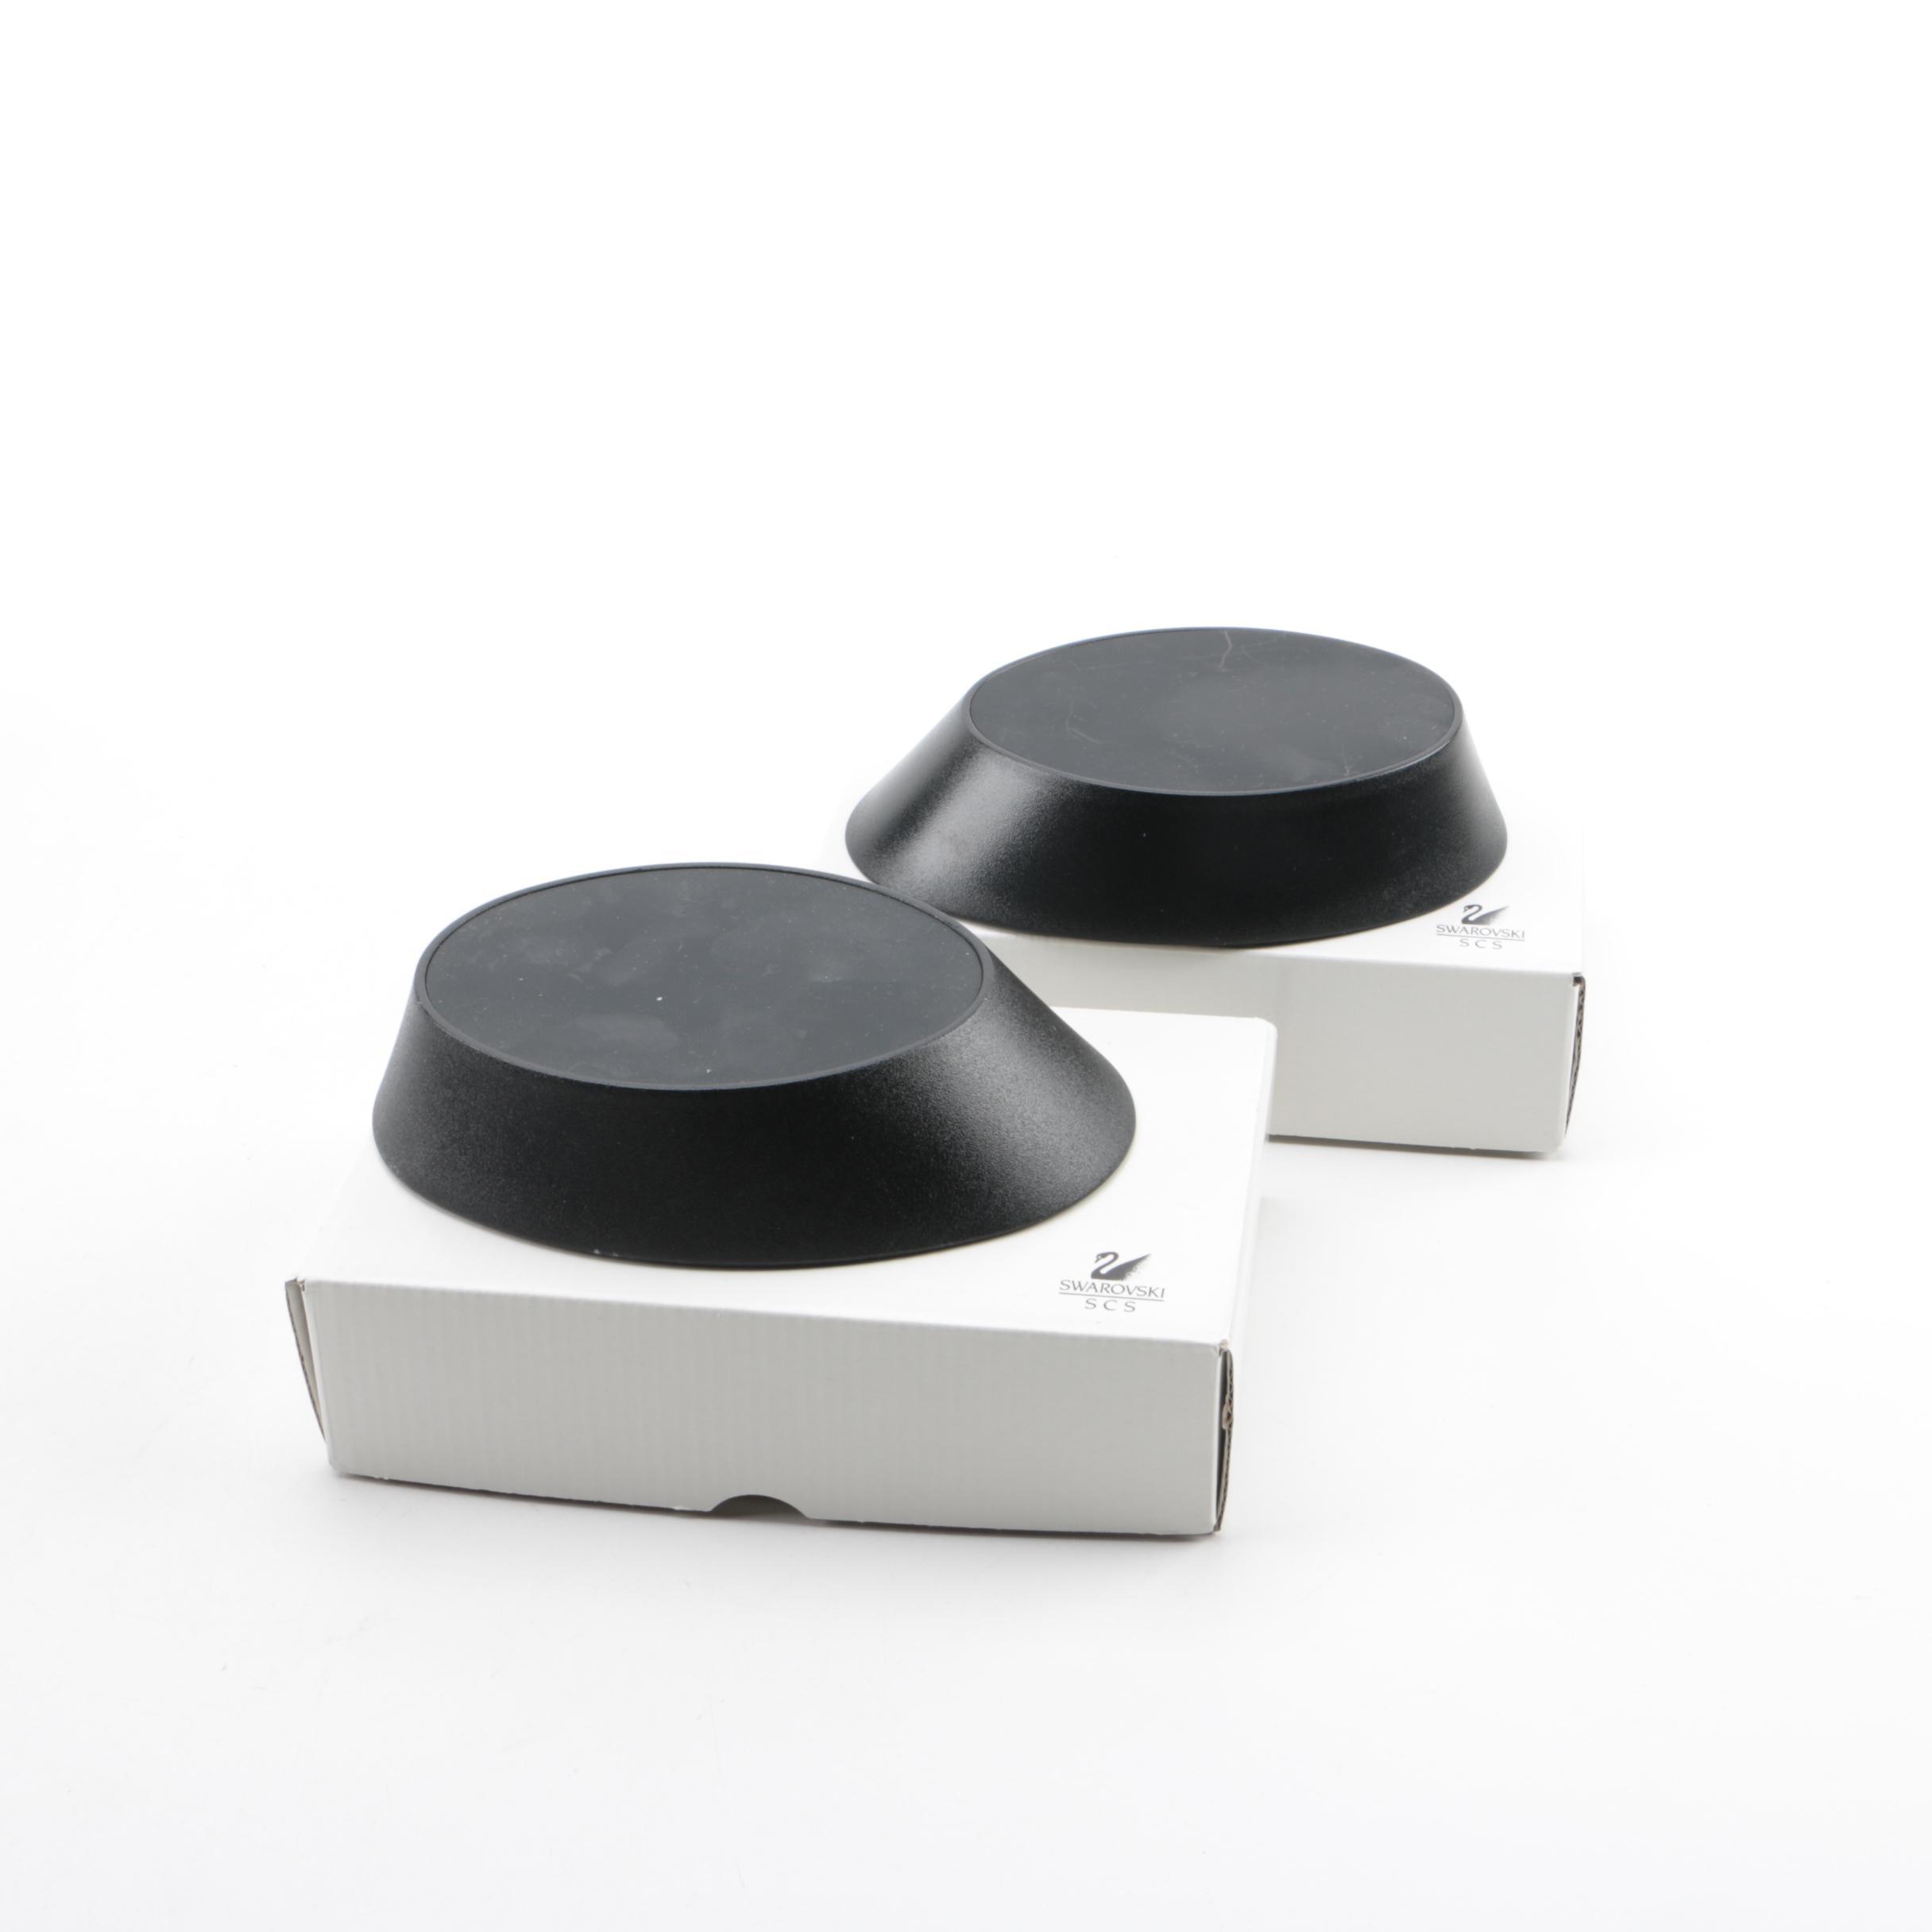 Swarovski Plastic Figurine Stands in Original Boxes